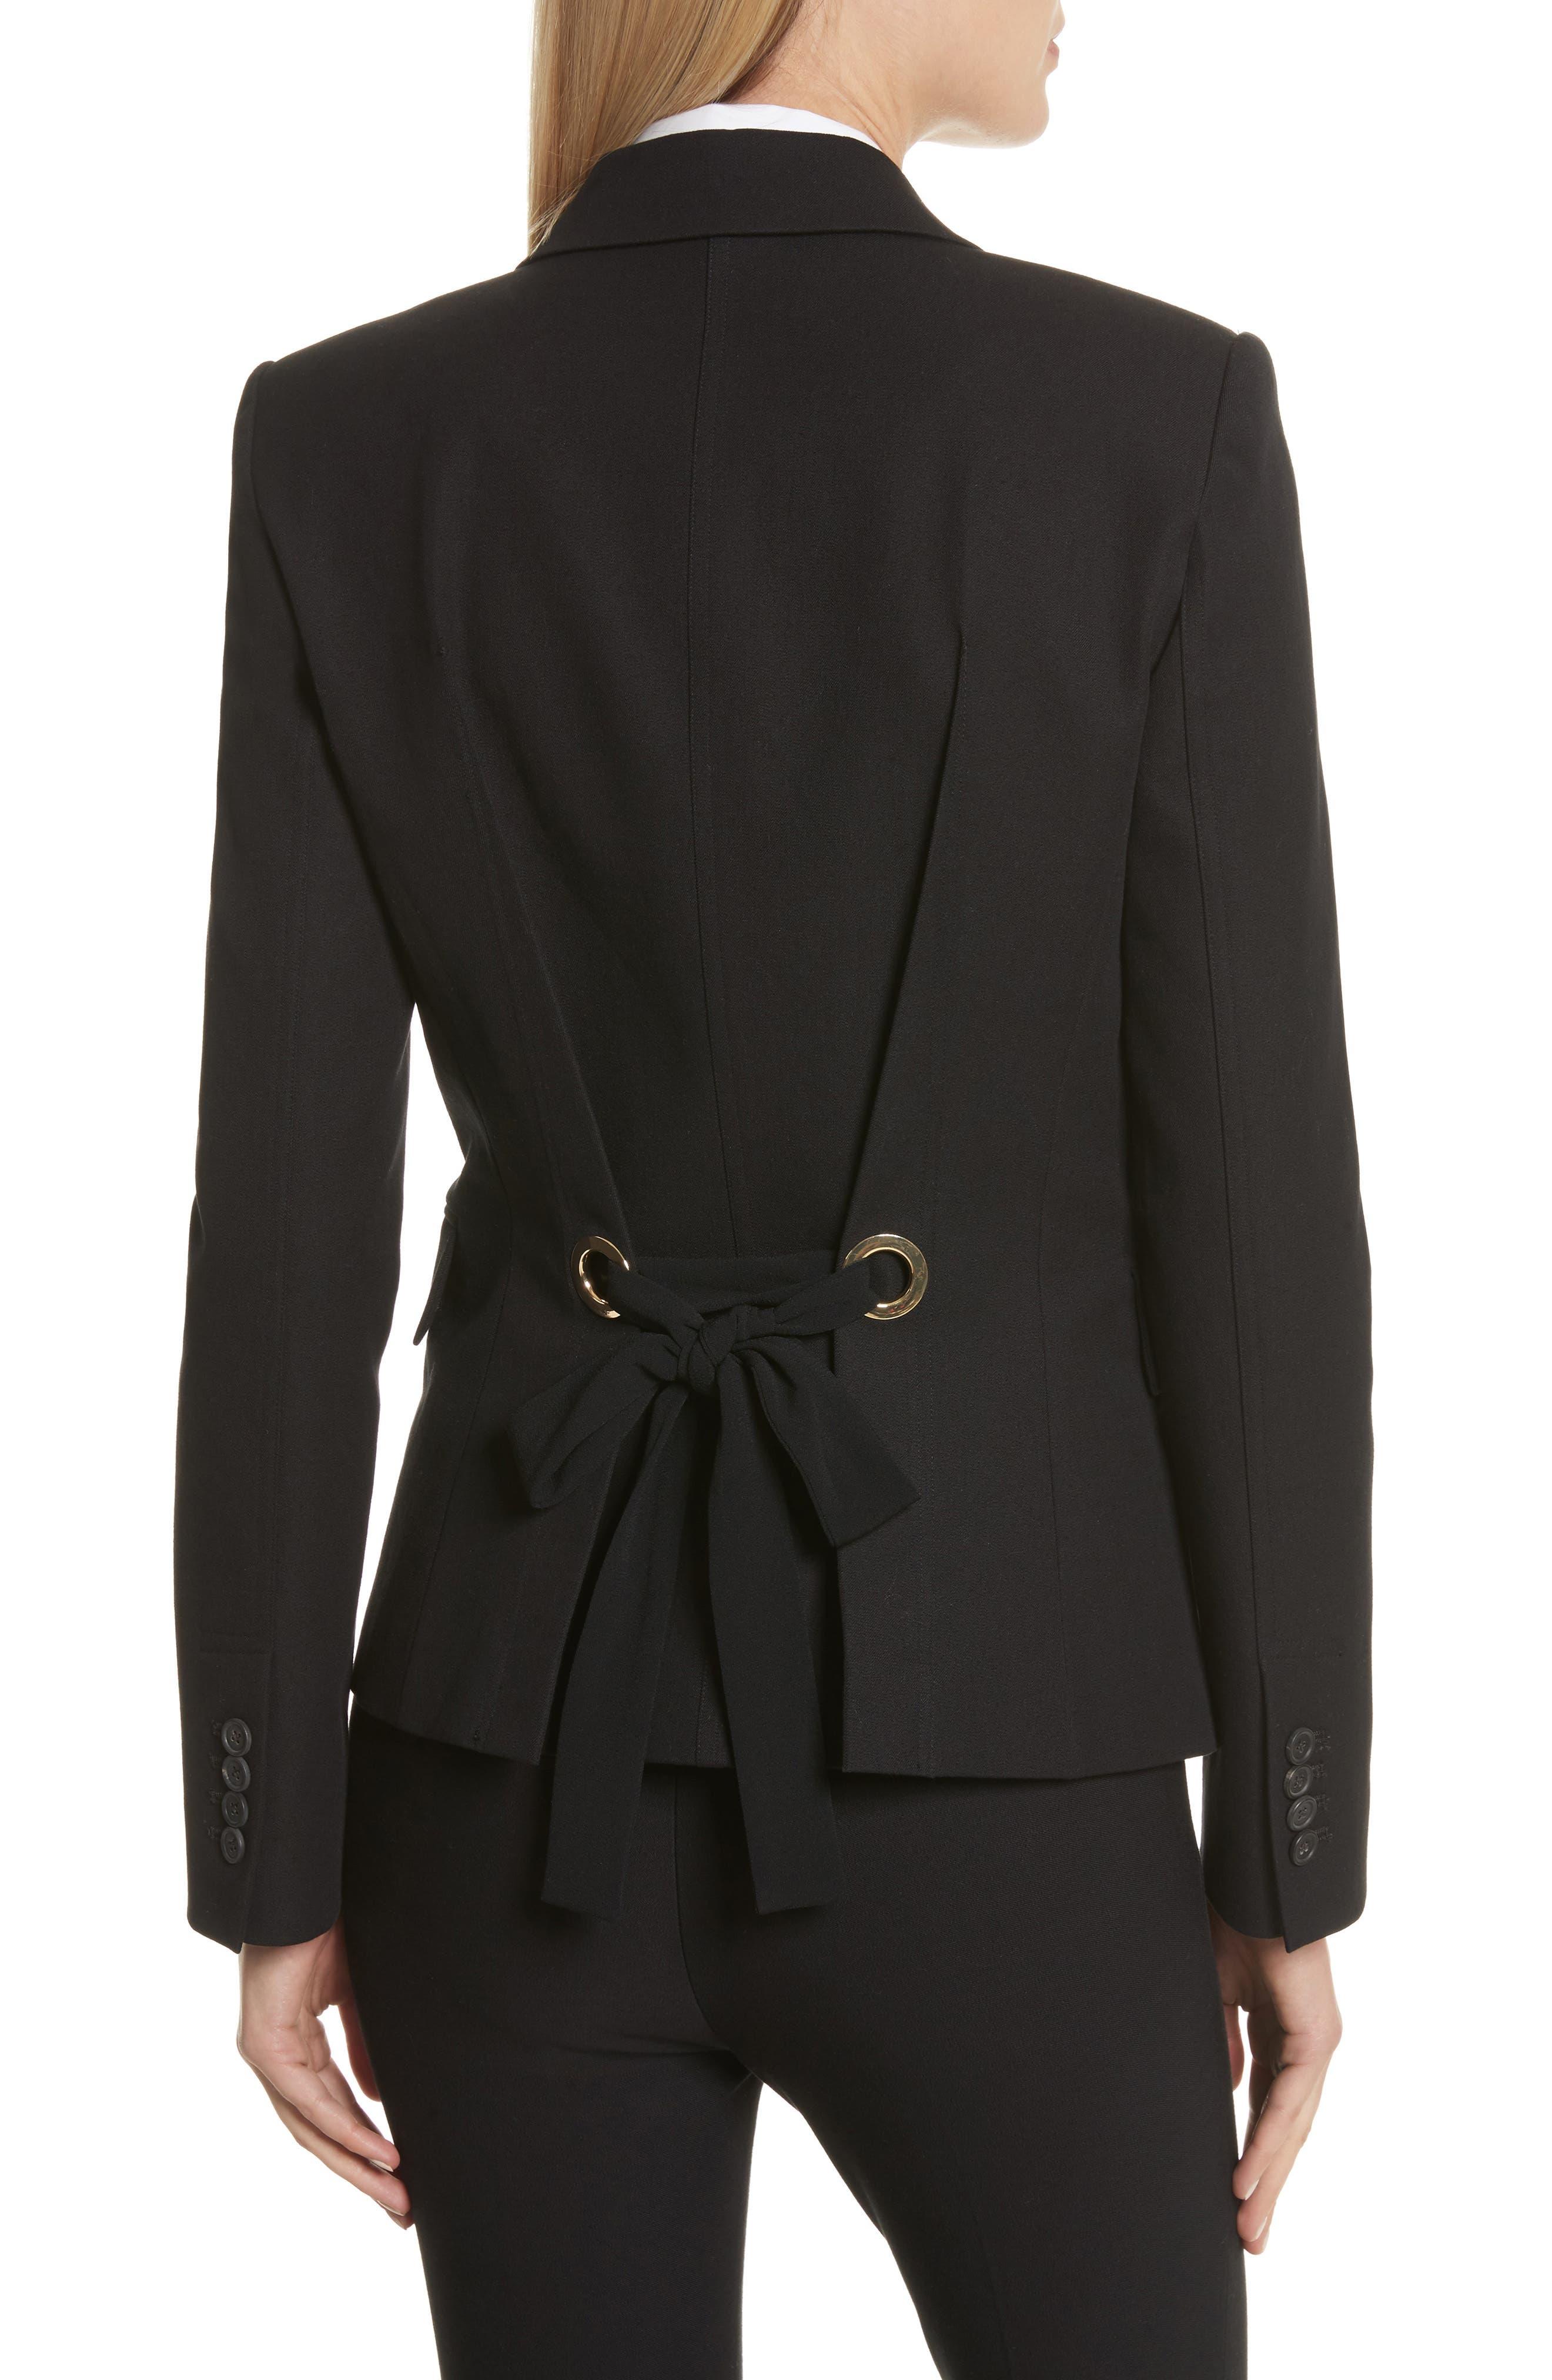 Grommet Tie Back Blazer,                             Alternate thumbnail 2, color,                             Black